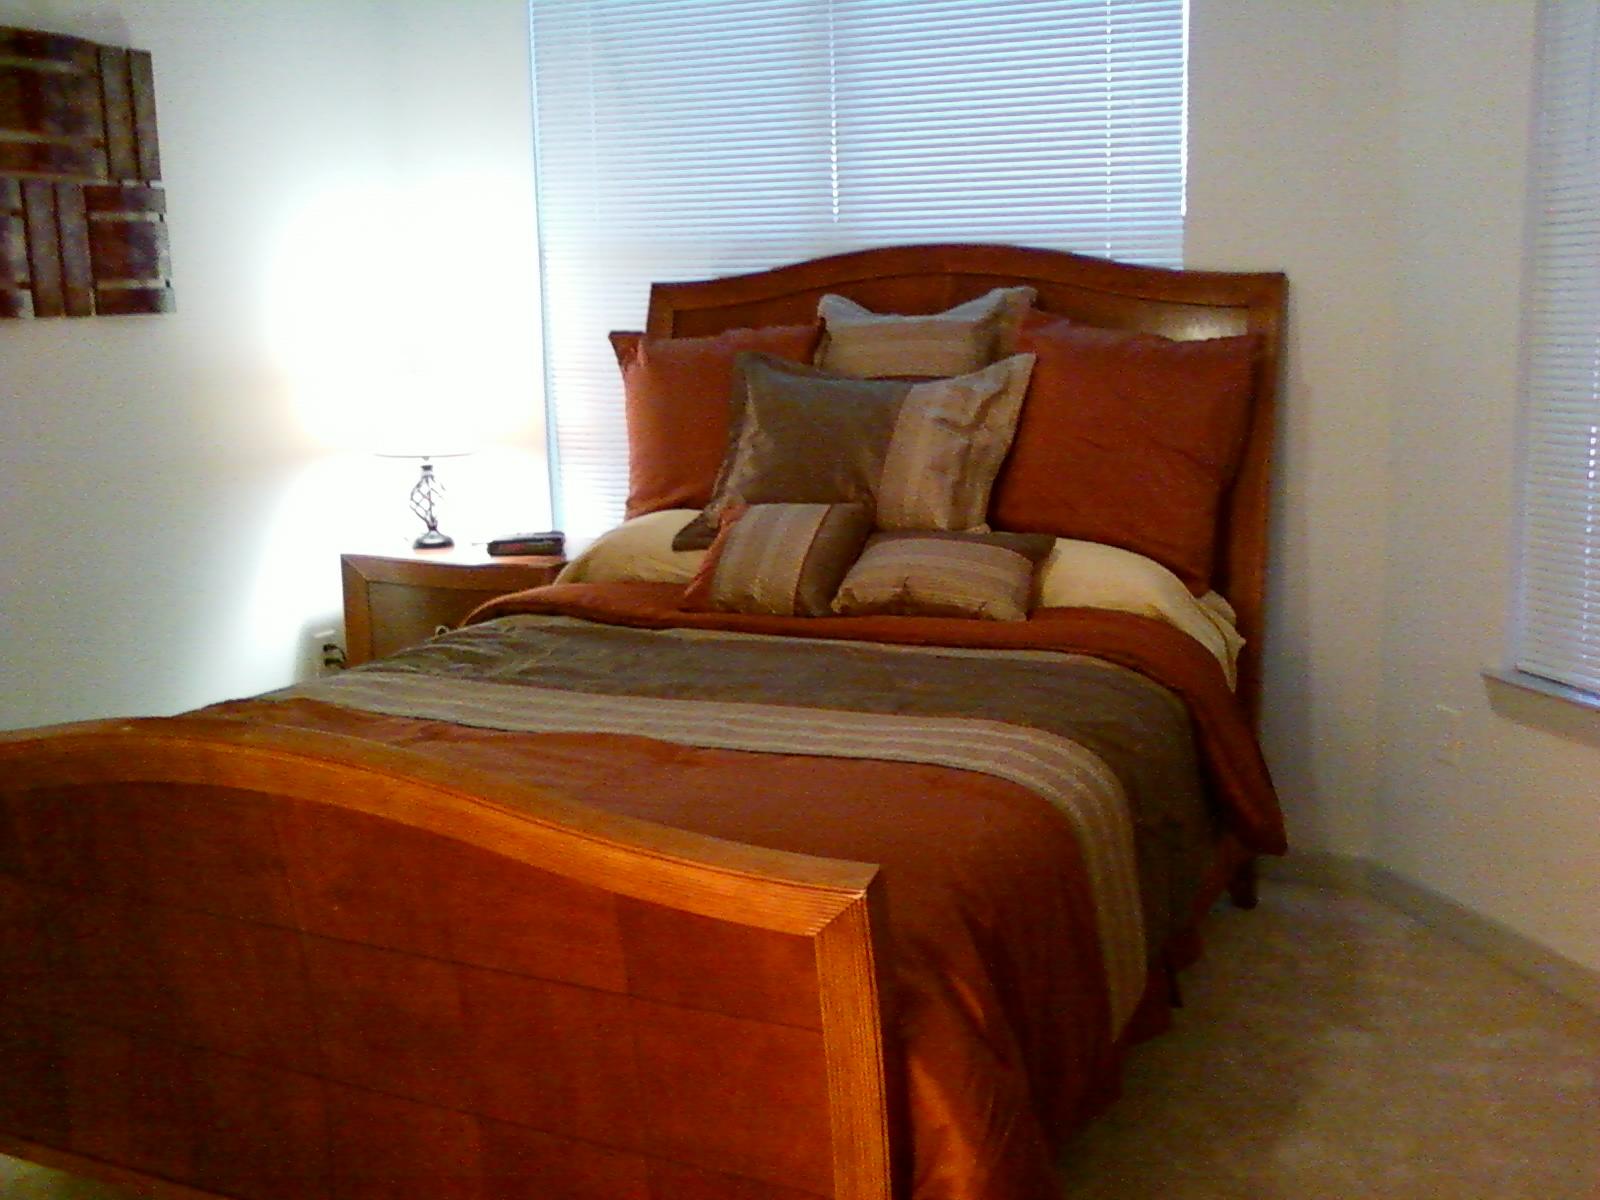 Craigslist Rooms For Rent In Dallas Tx. design chic design of cheap ...